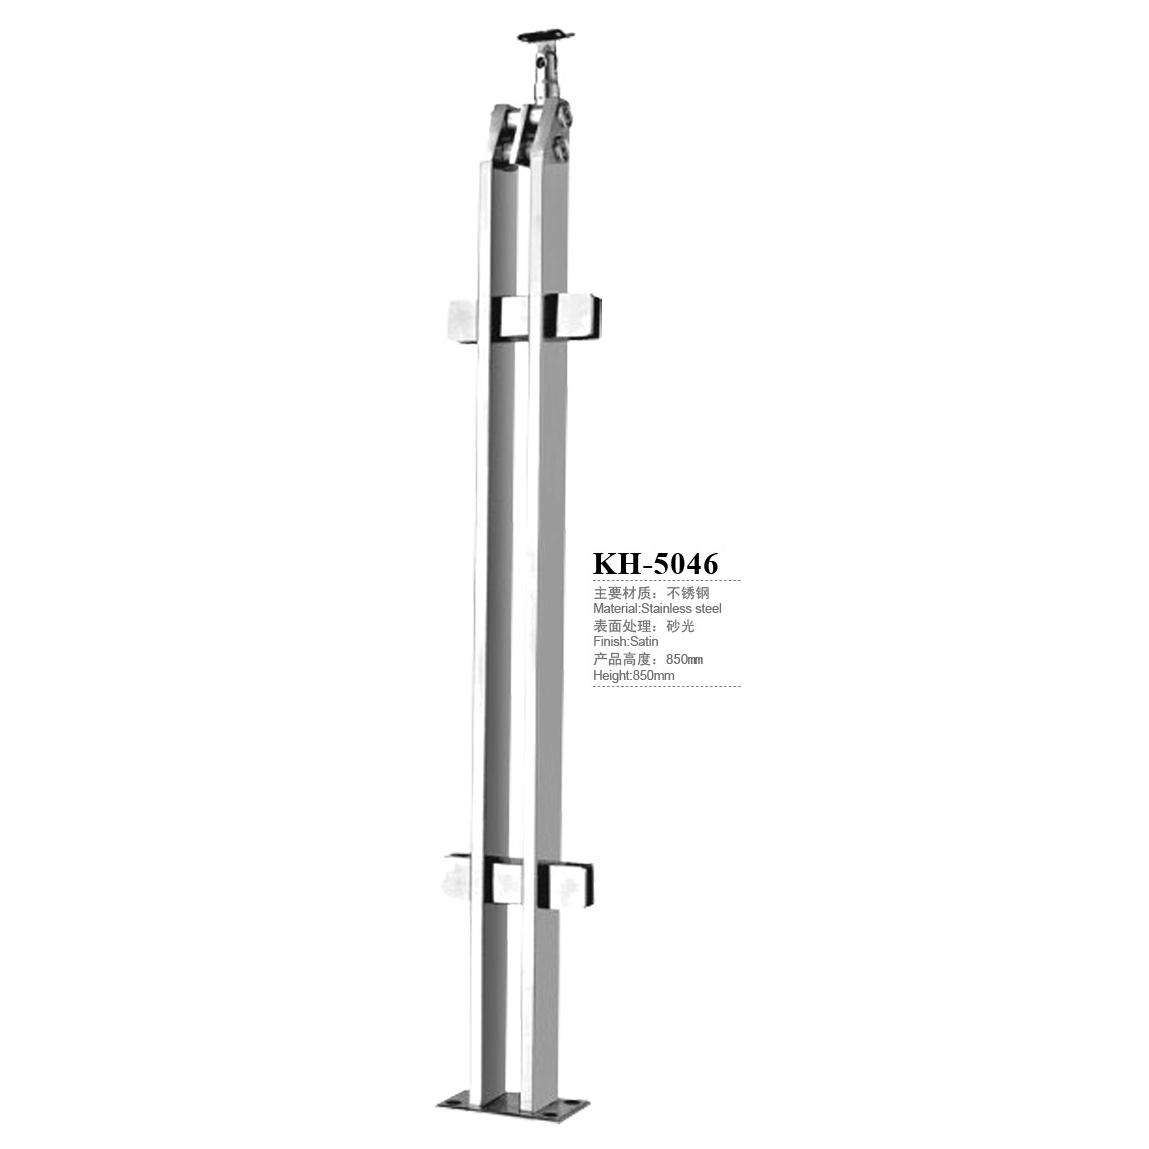 Stainless Steel Glass Handrail Railing Post